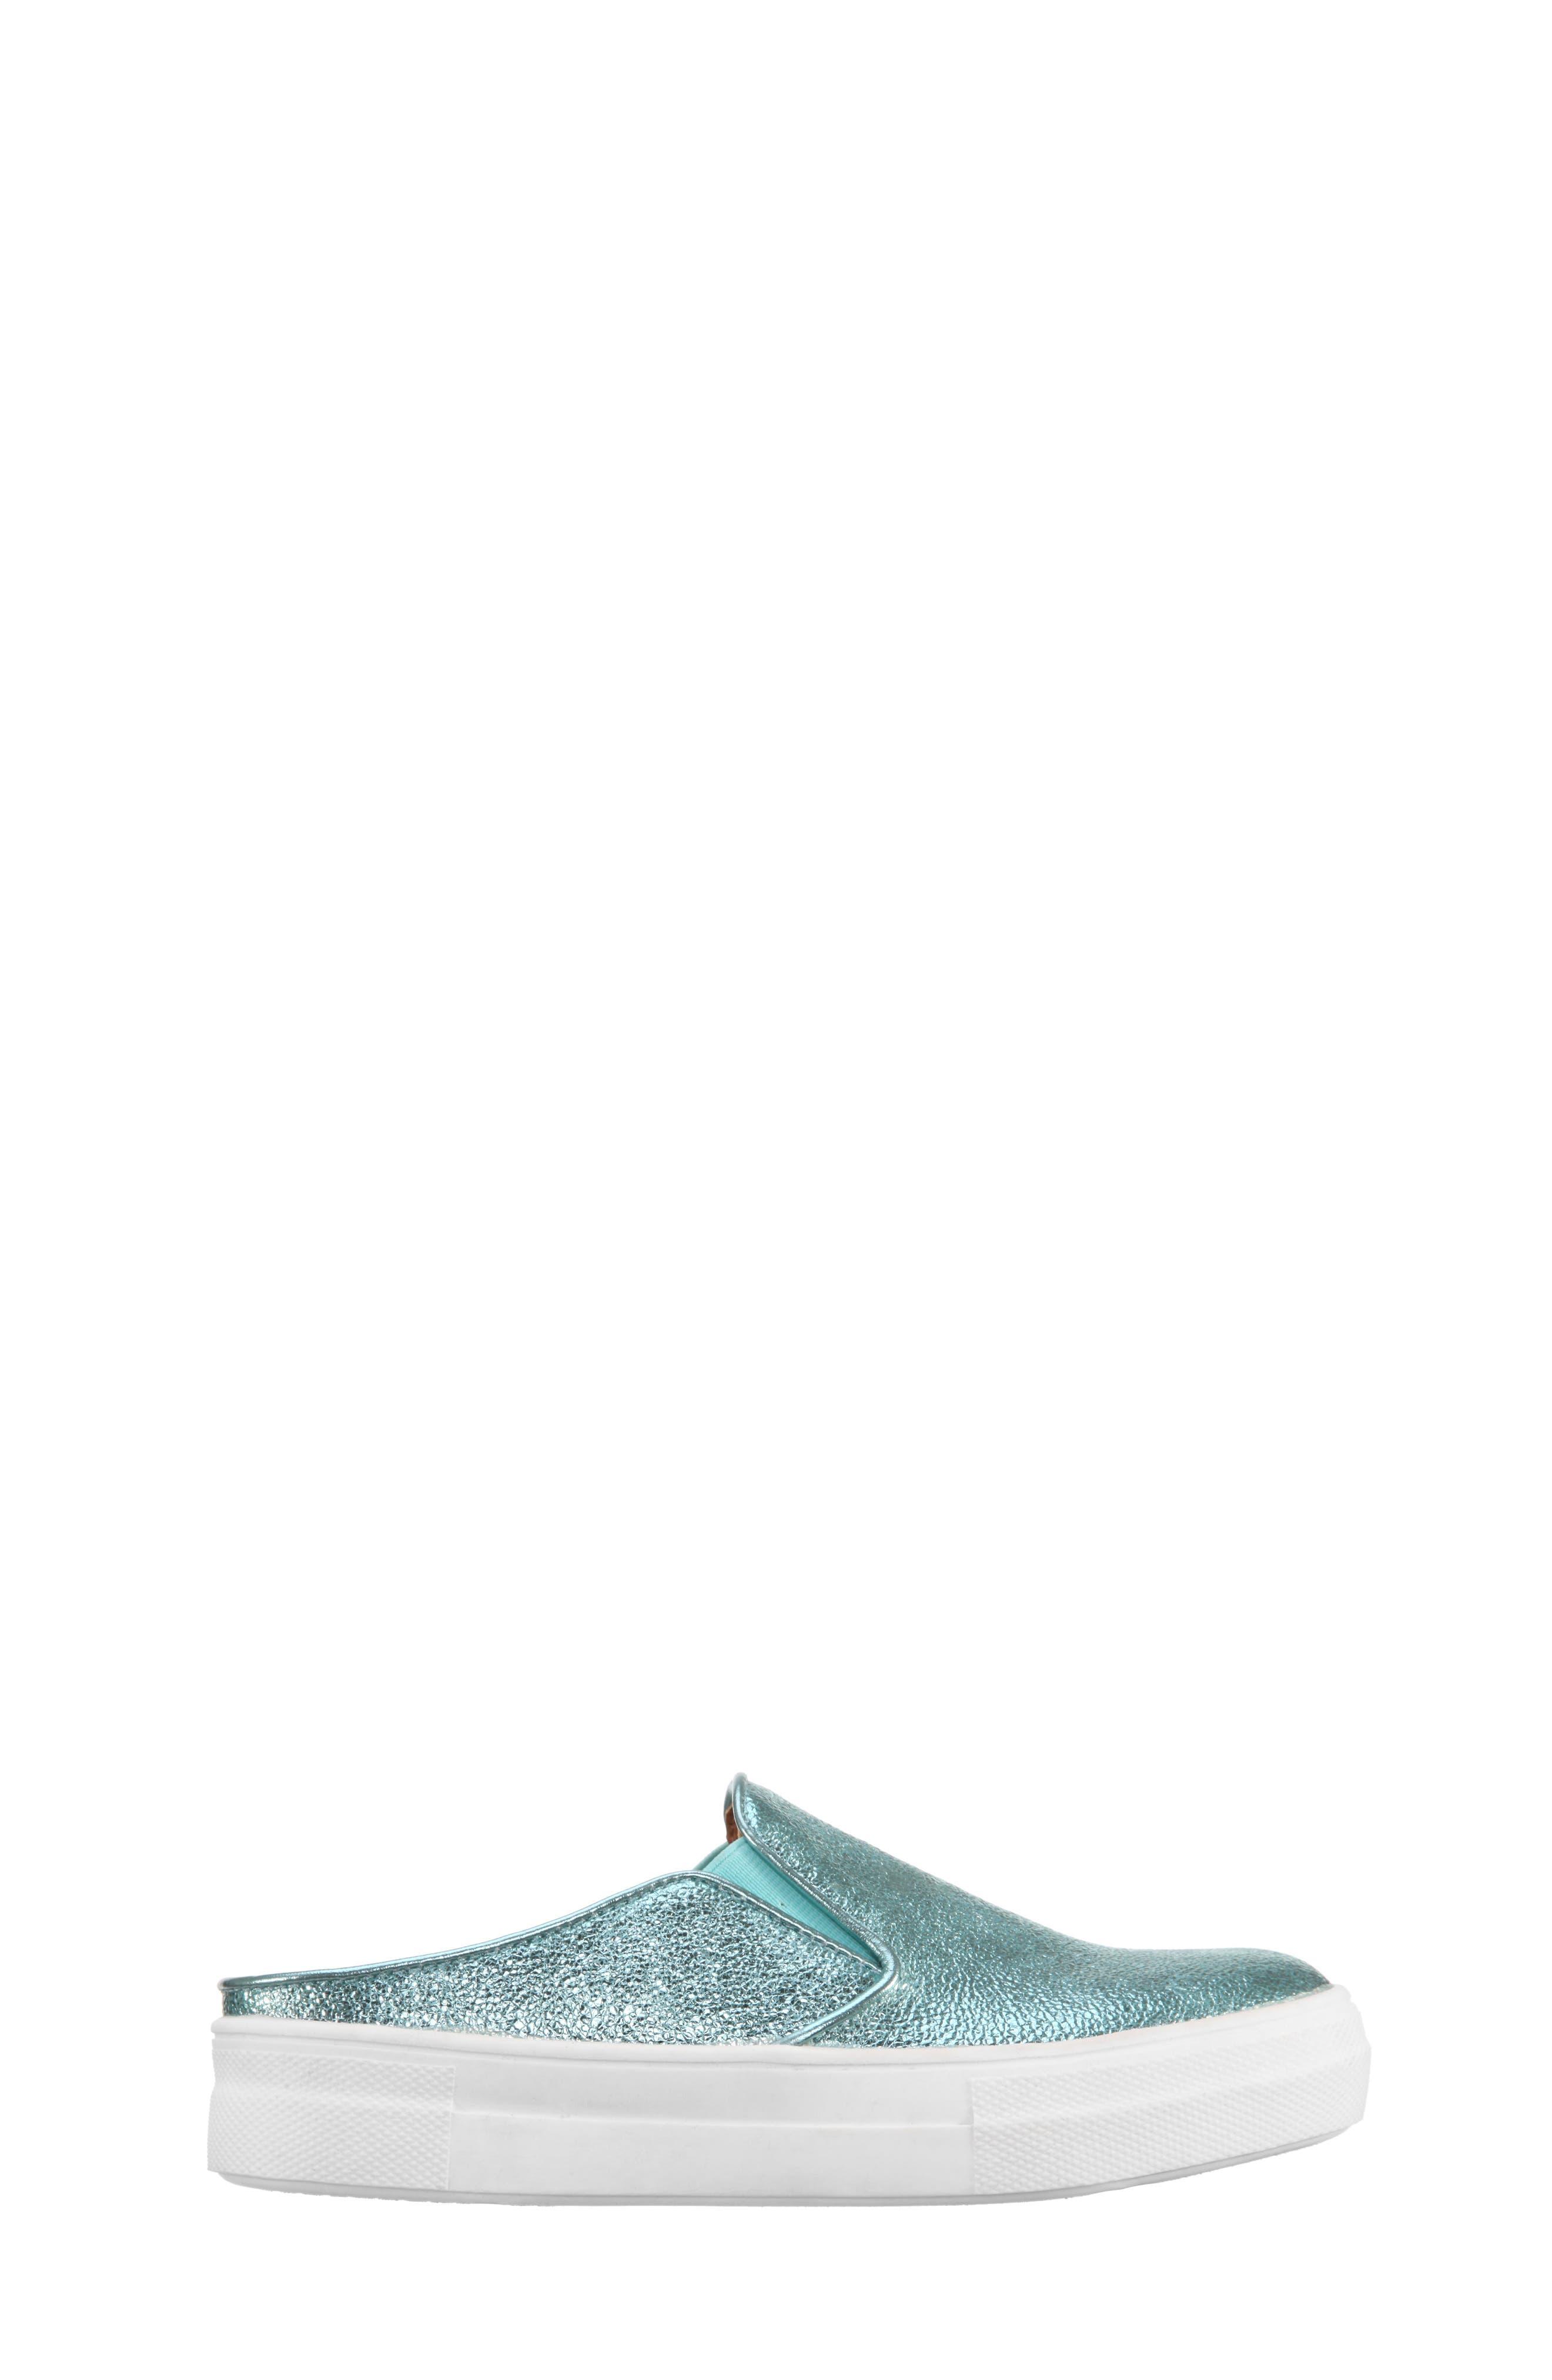 Gail Metallic Slip-On Sneaker Mule,                             Alternate thumbnail 8, color,